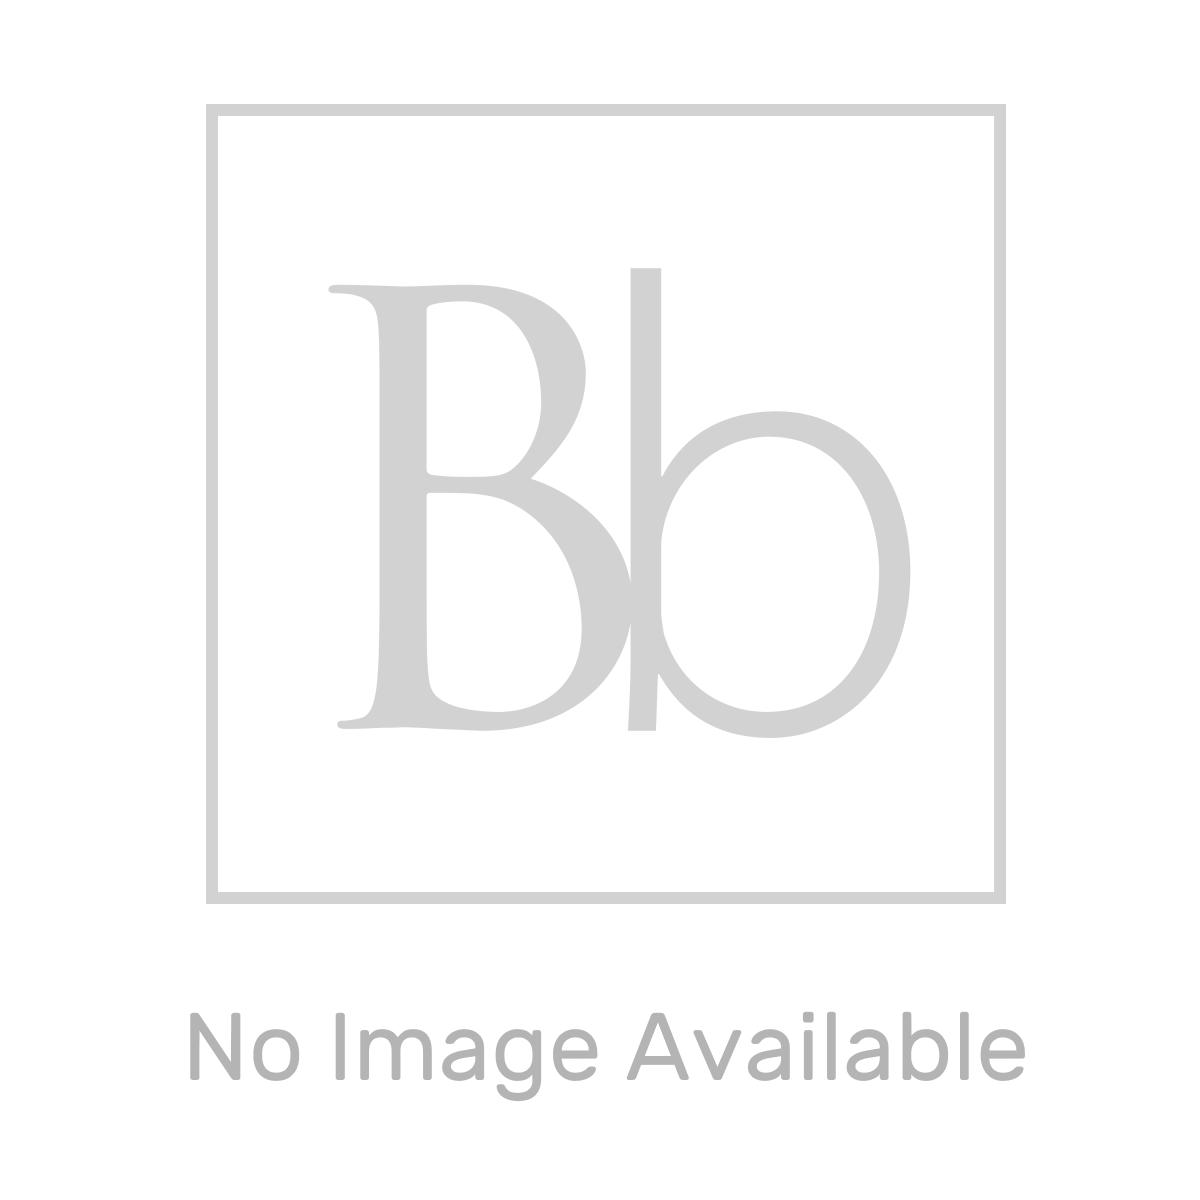 RAK Compact Comfort Height Flush To Wall Toilet